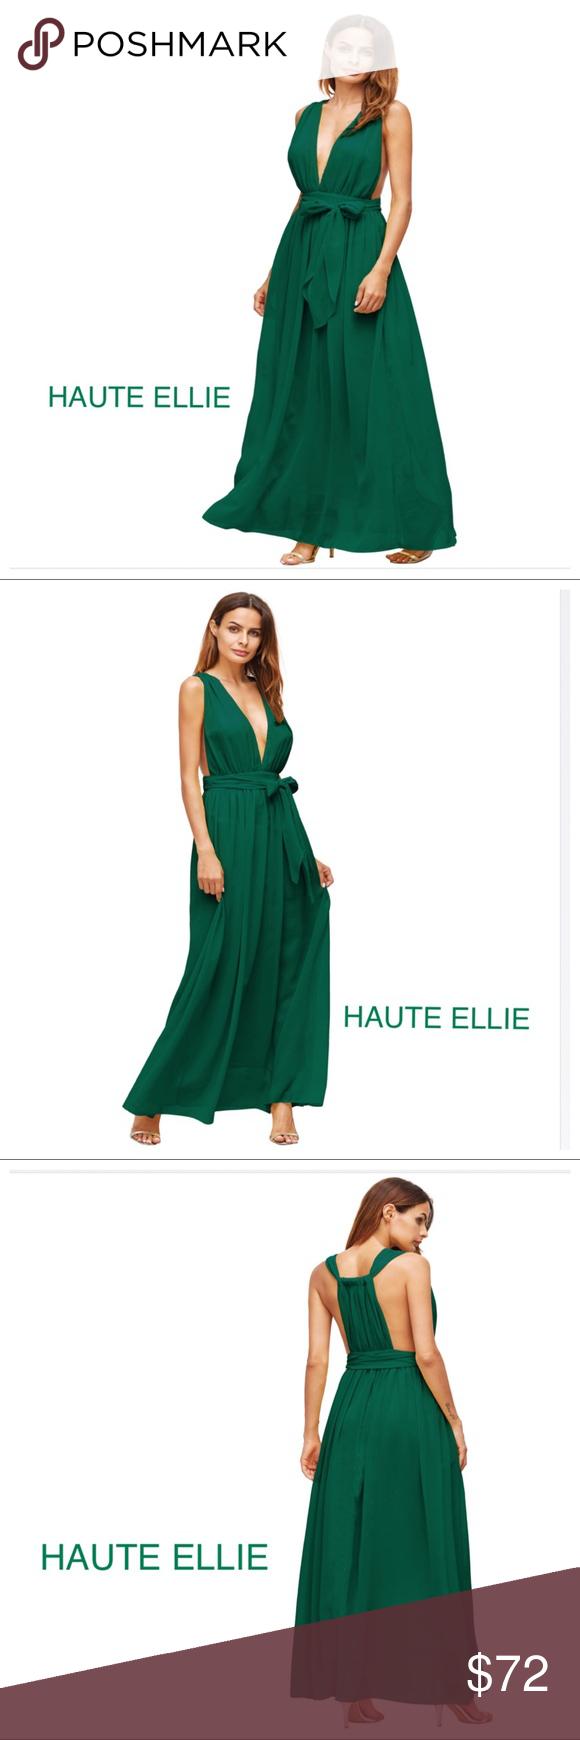 green envy deep vneck halter dress green envy deep vneck